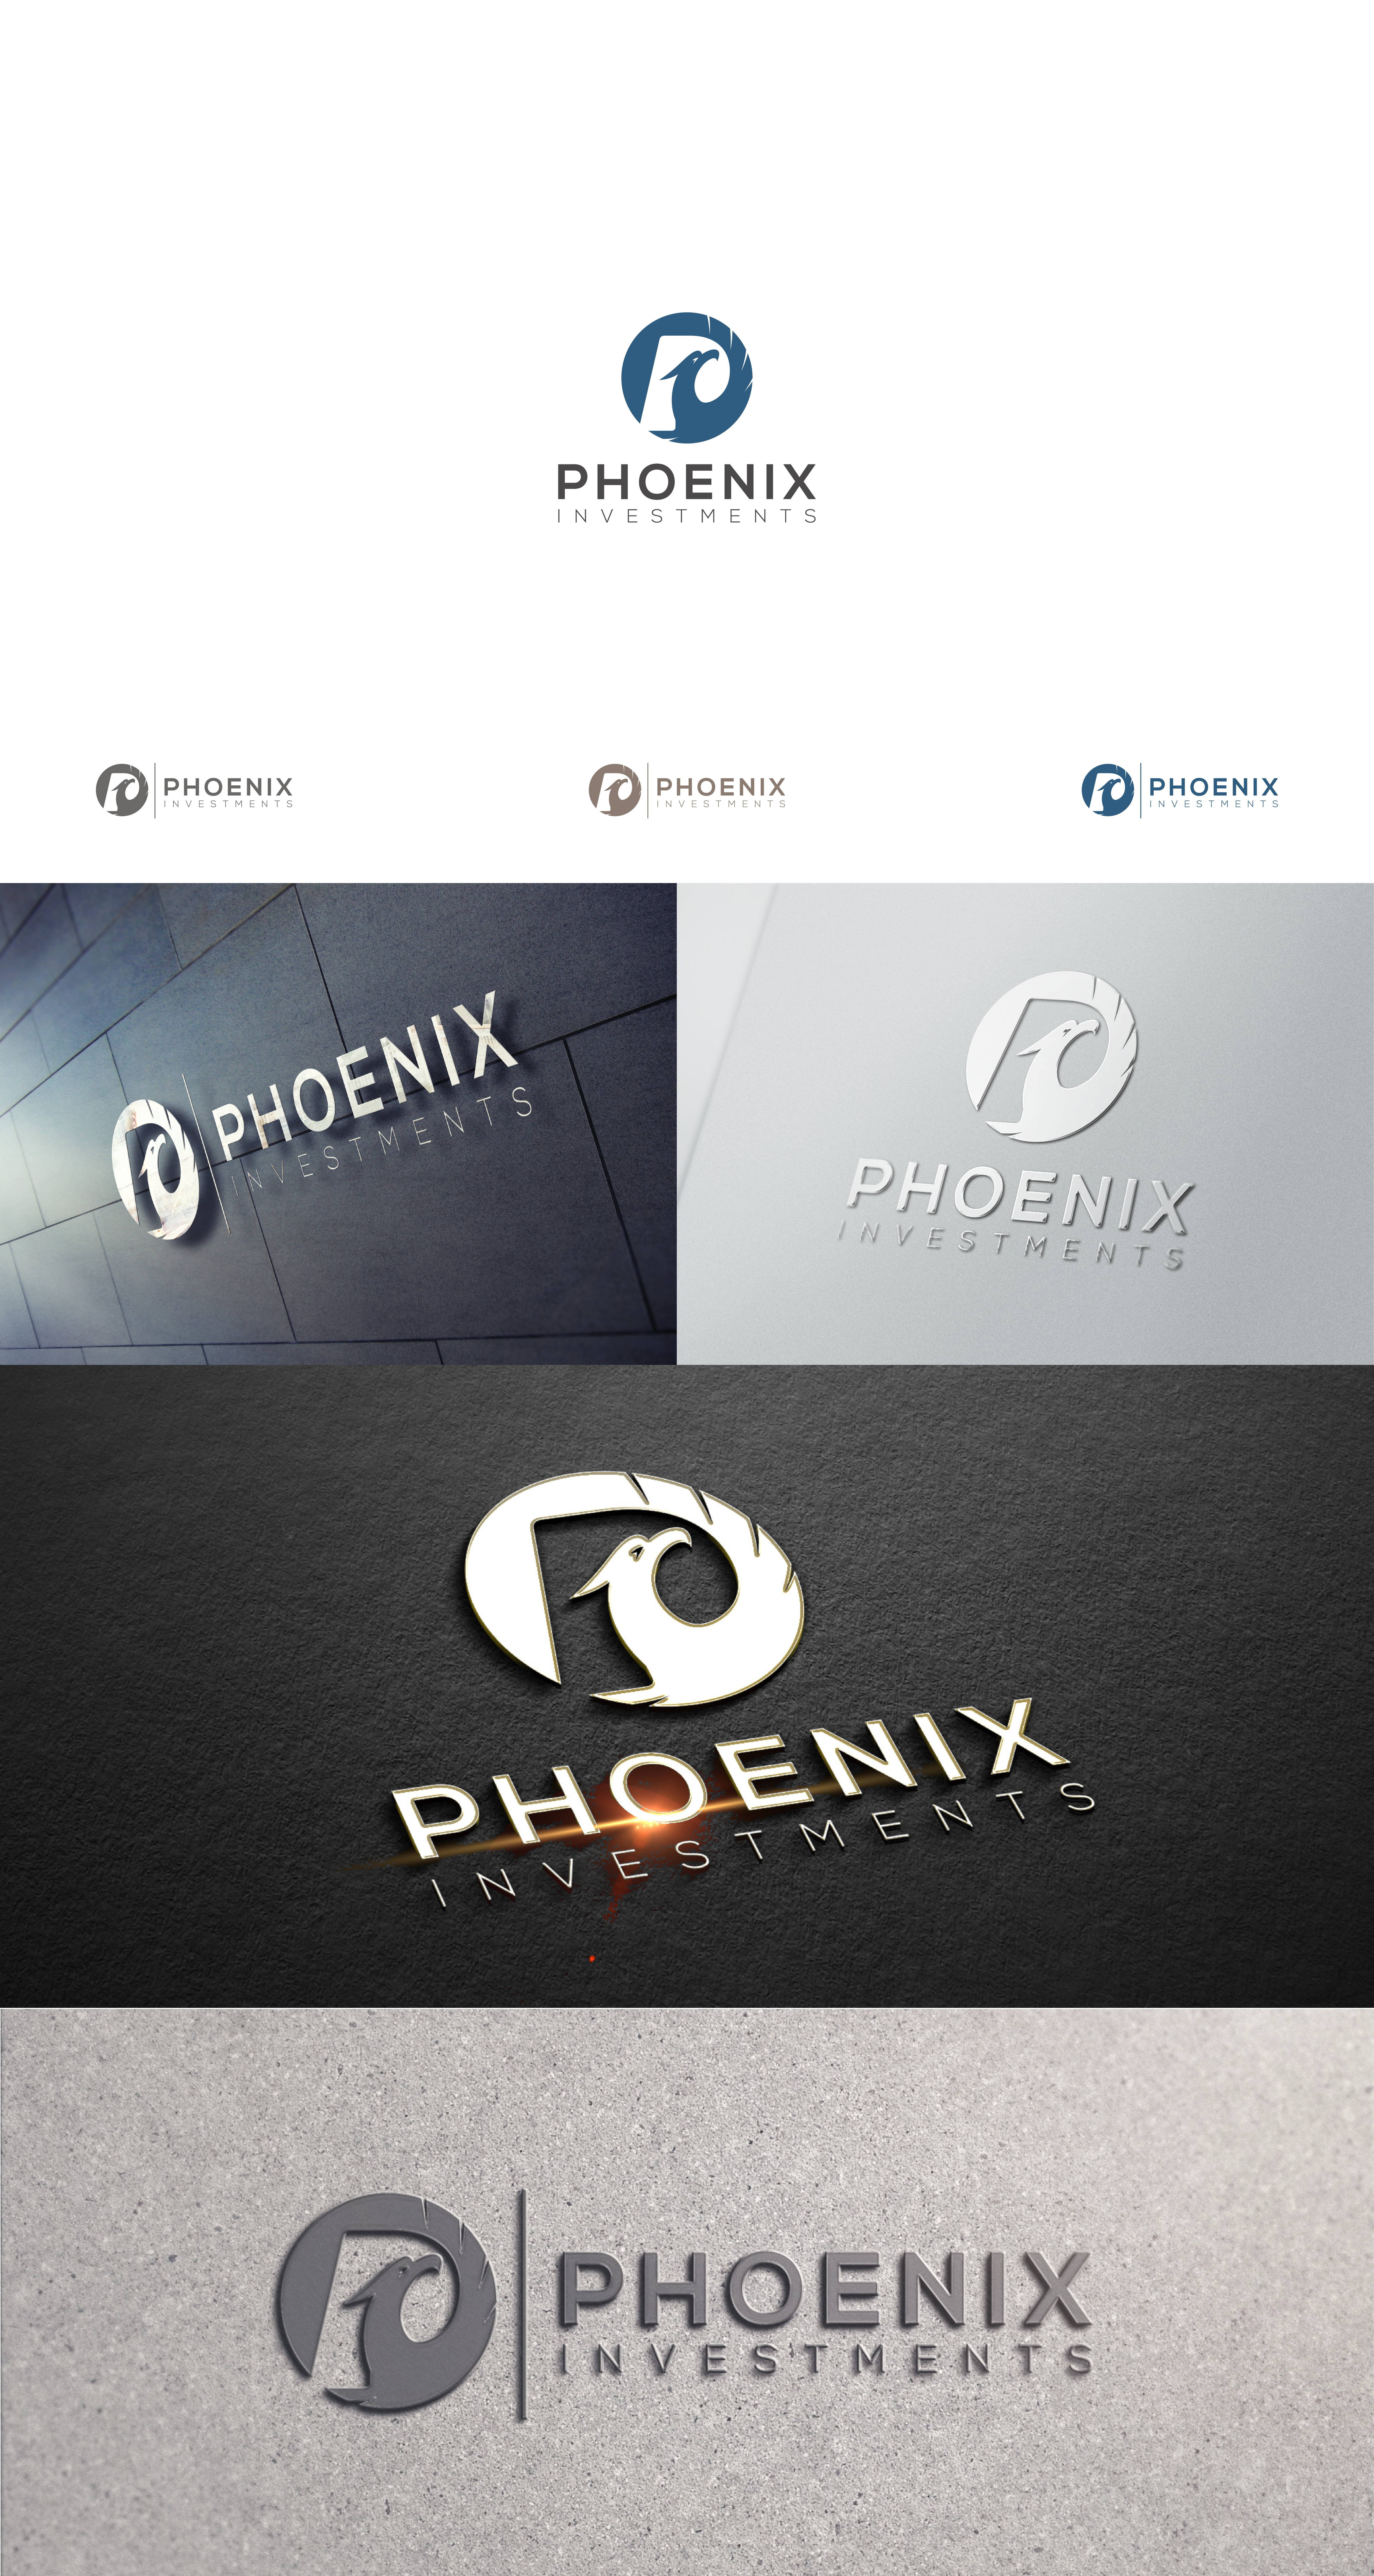 Phoenix Investments Needs an Amazing Design